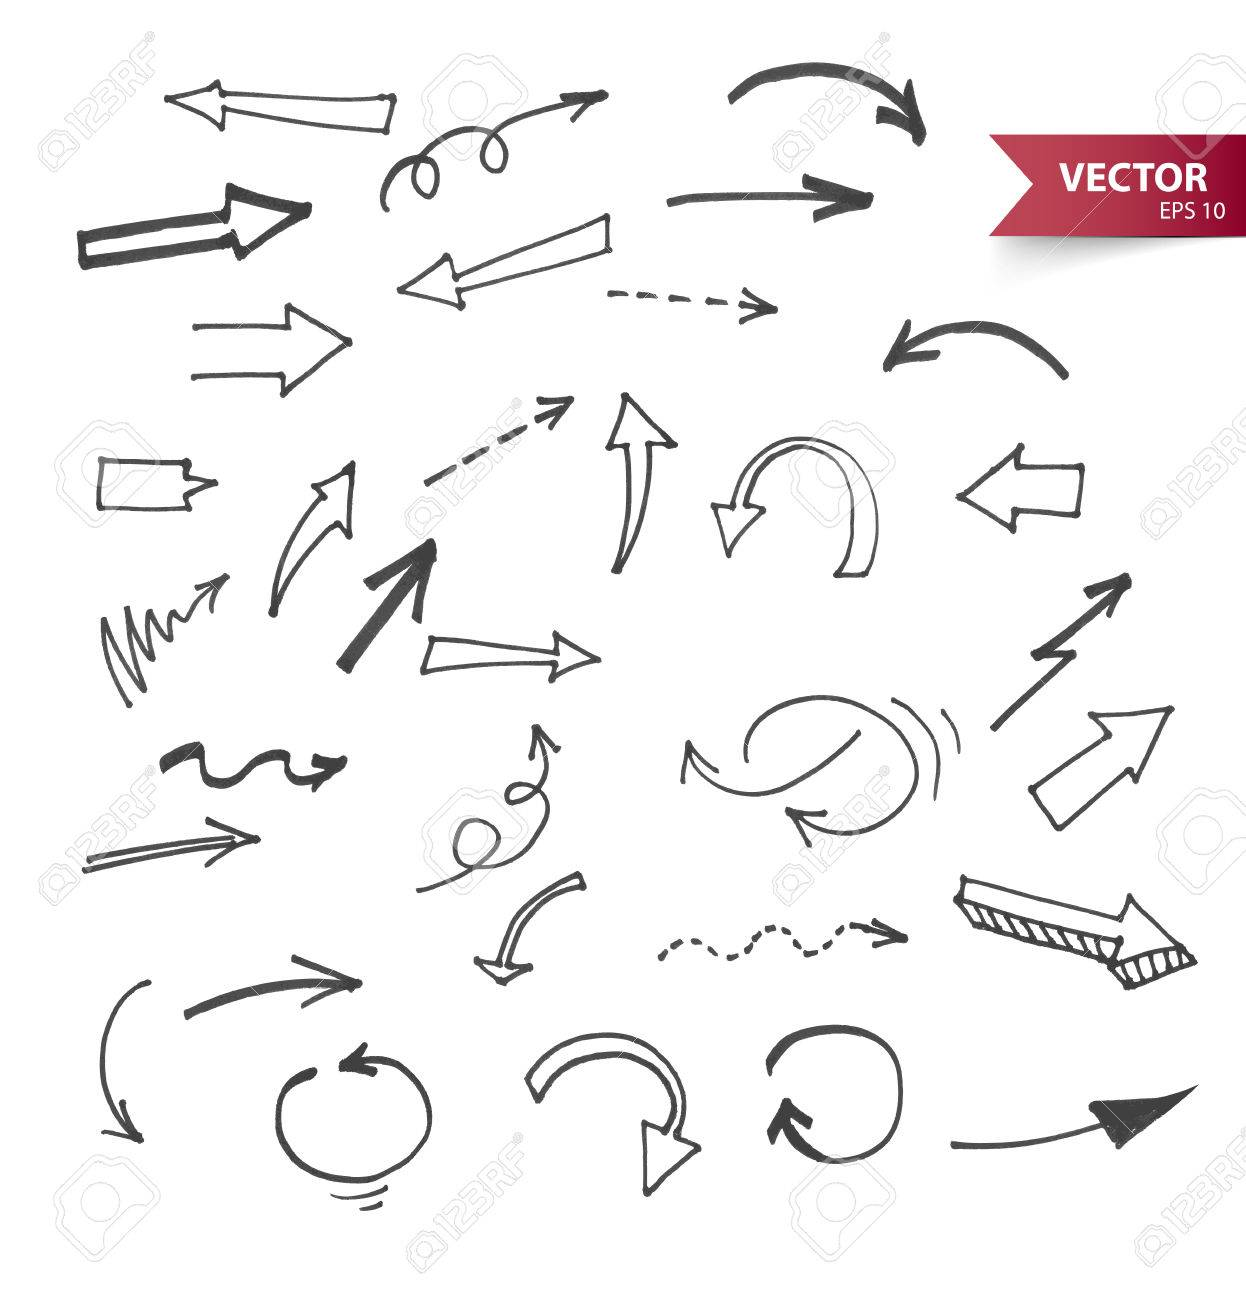 Illustration of Arrows - 27679345